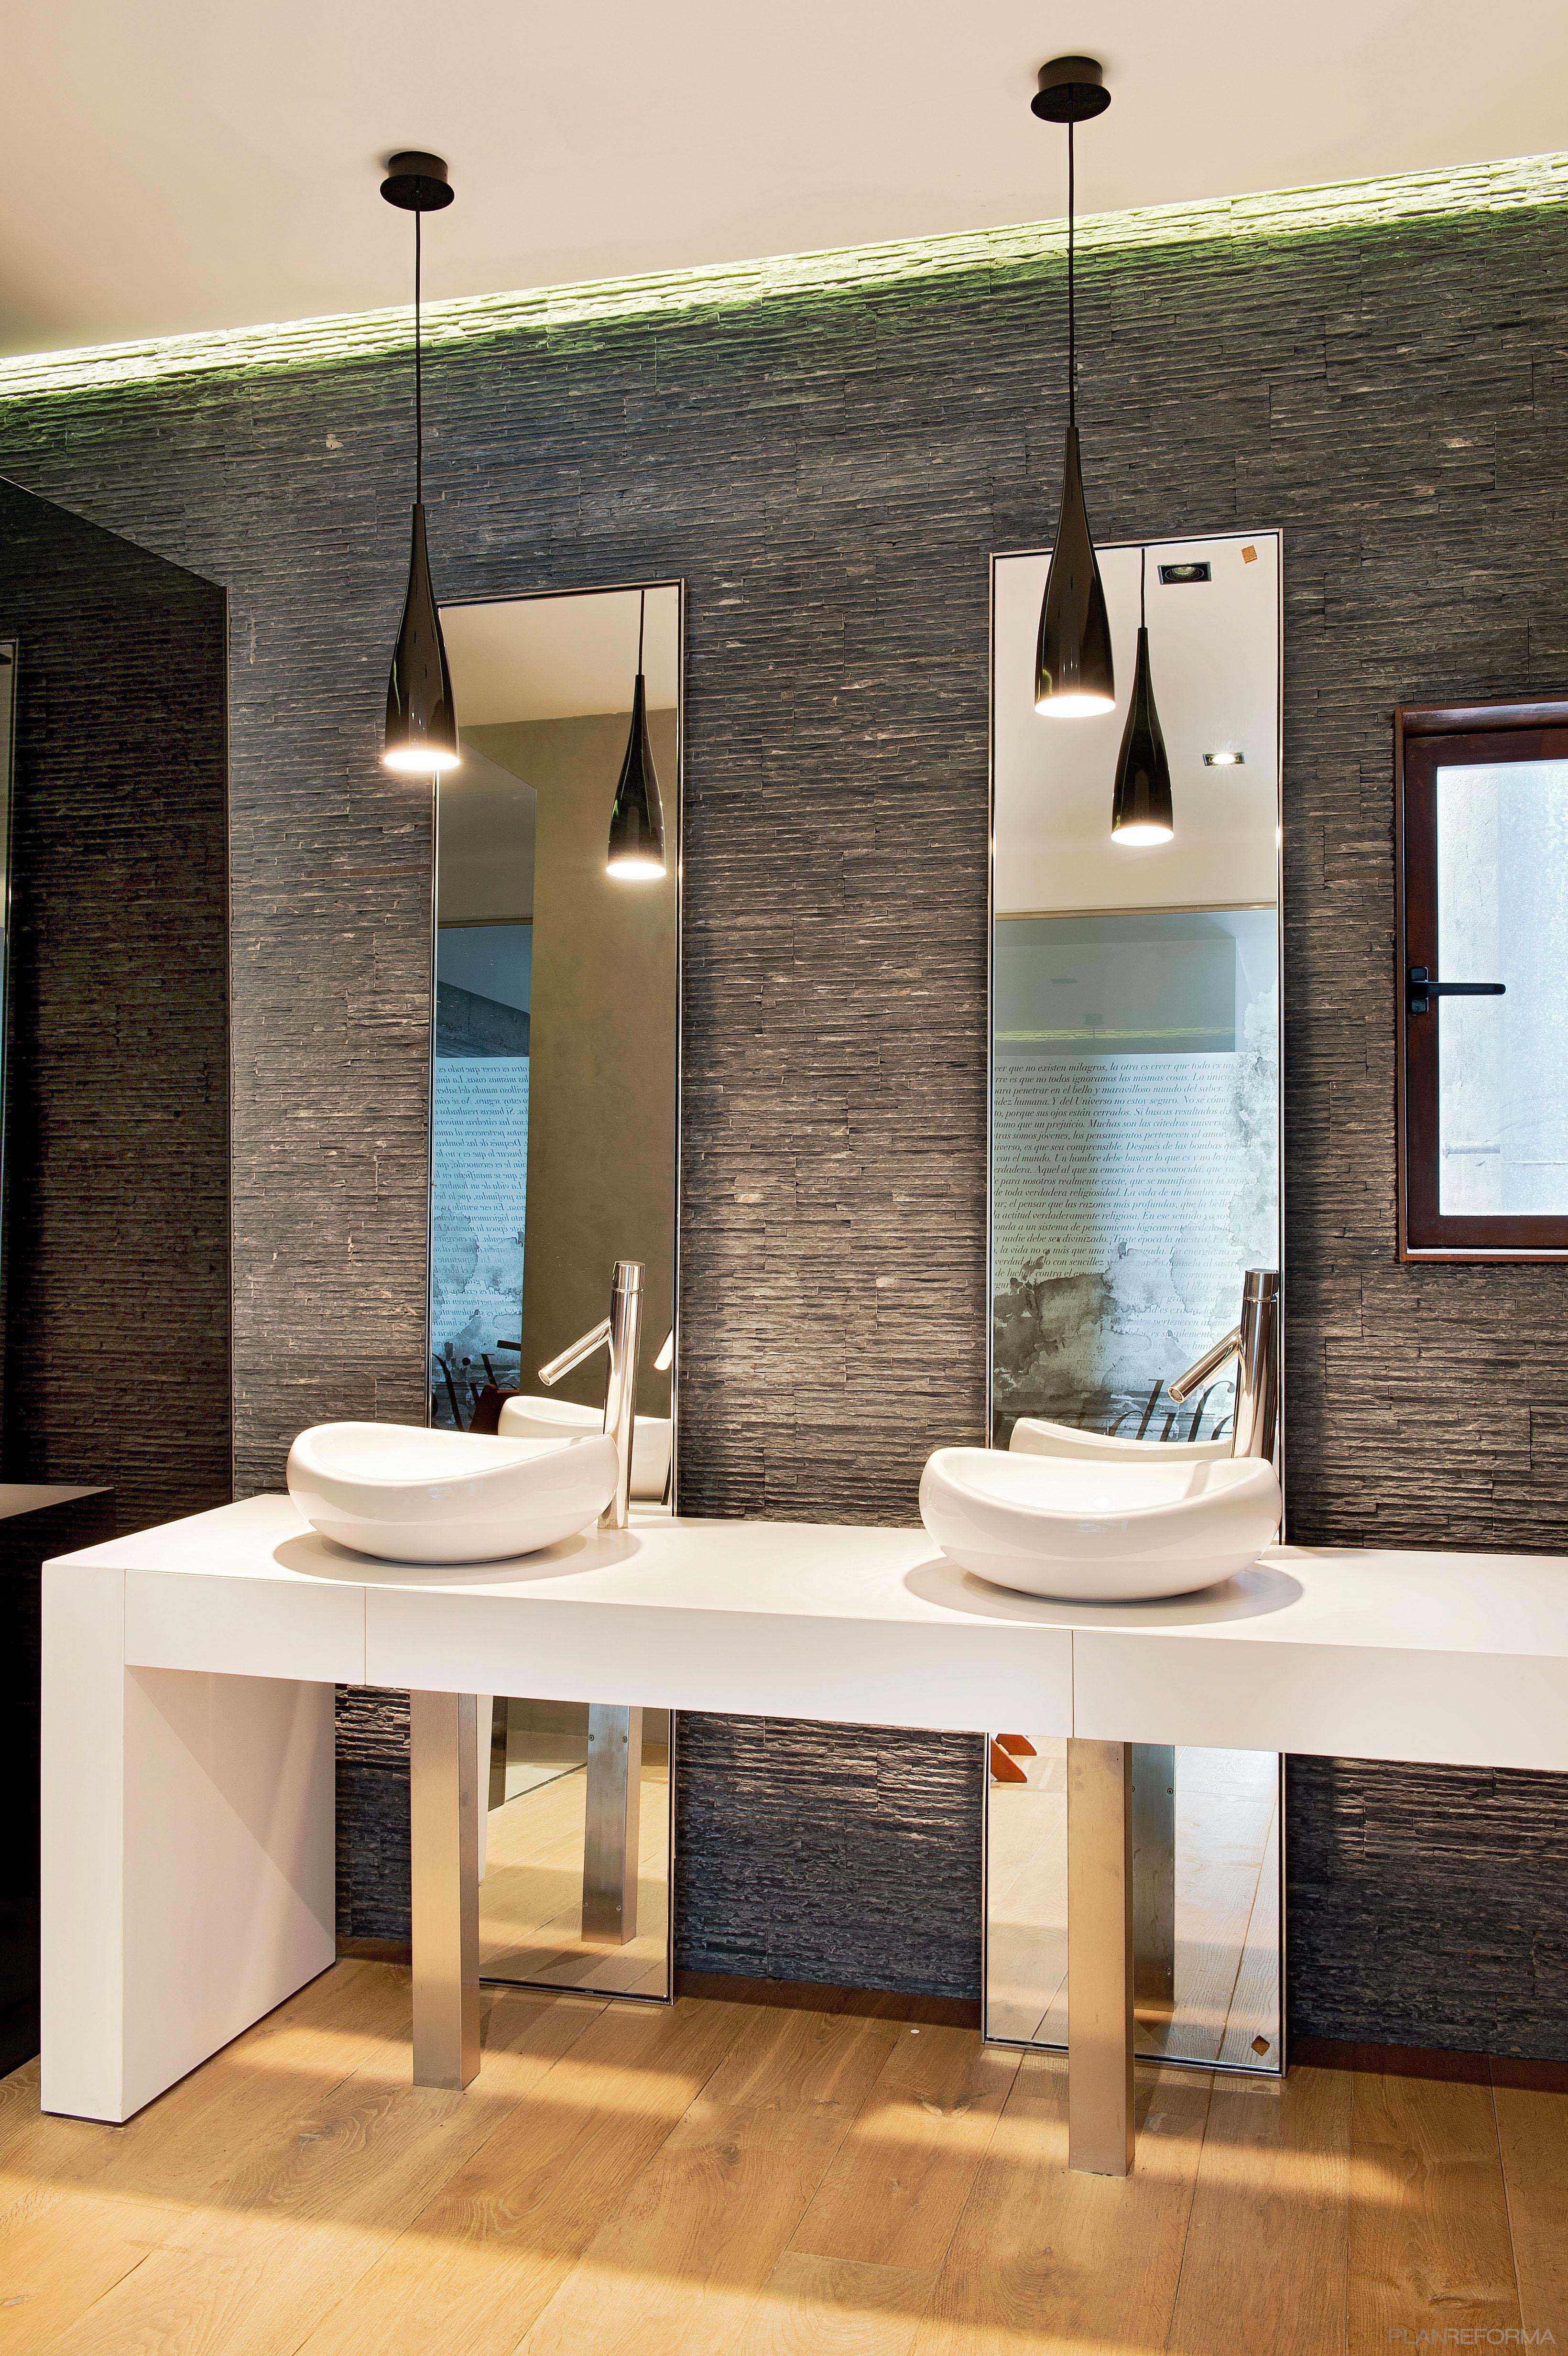 Baños Grises Modernos:Baño Estilo moderno Color marron, blanco, gris, gris, negro diseñado